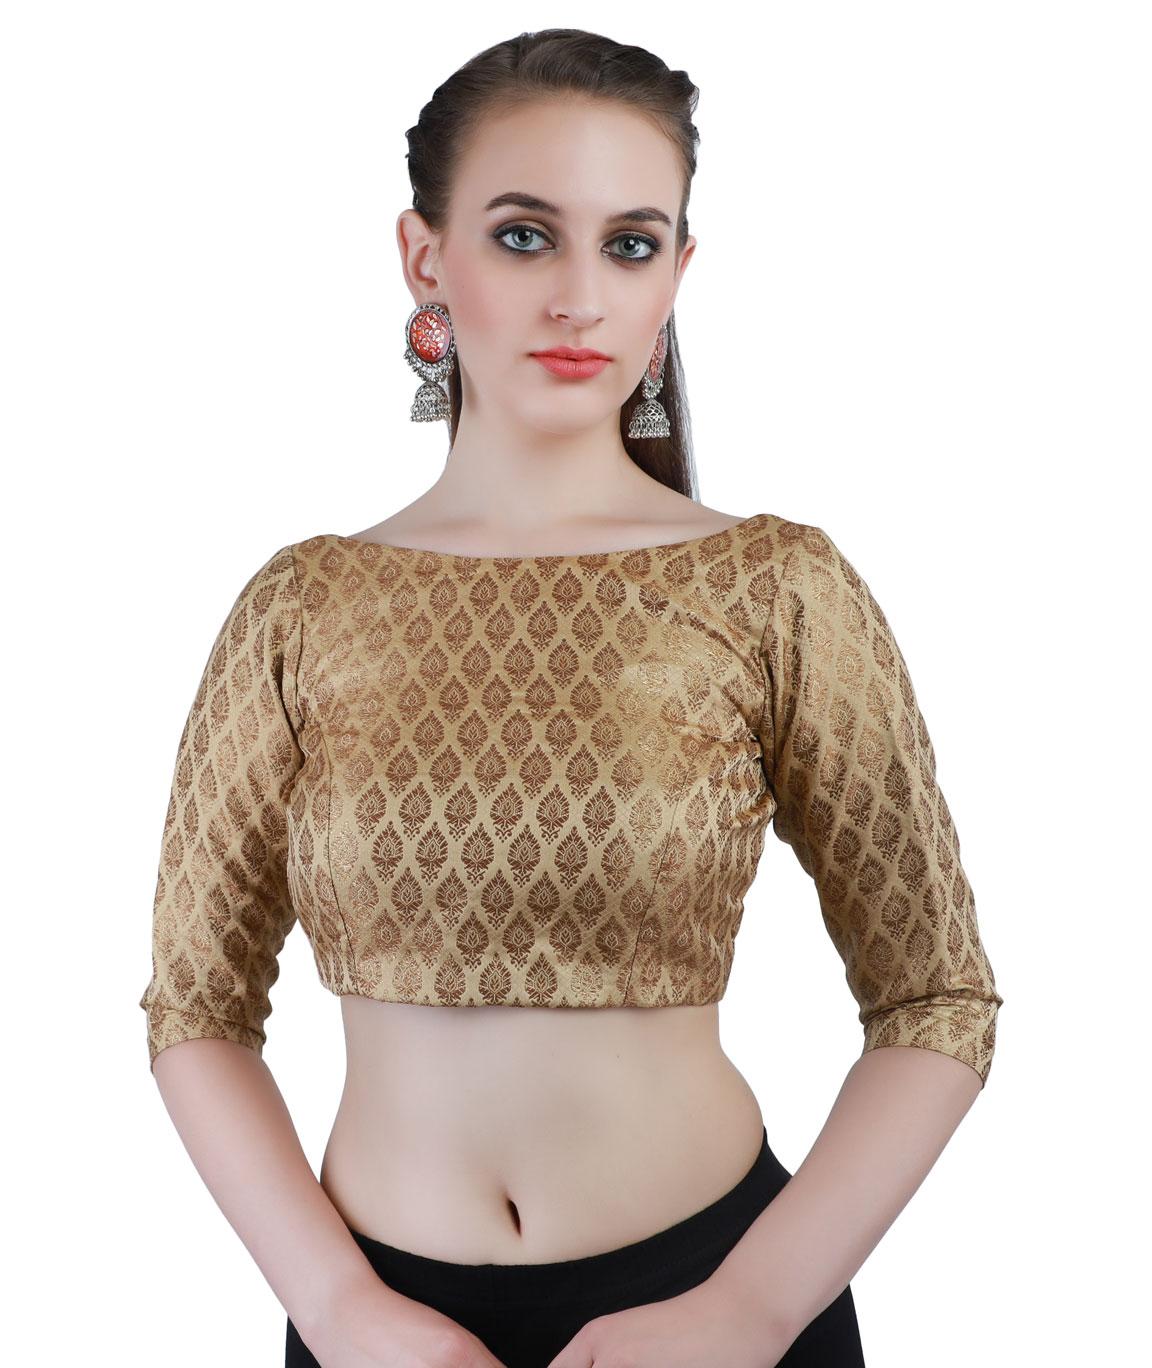 Banarasi Handloom Silk Jamawer Front-Open Blouse in Gold